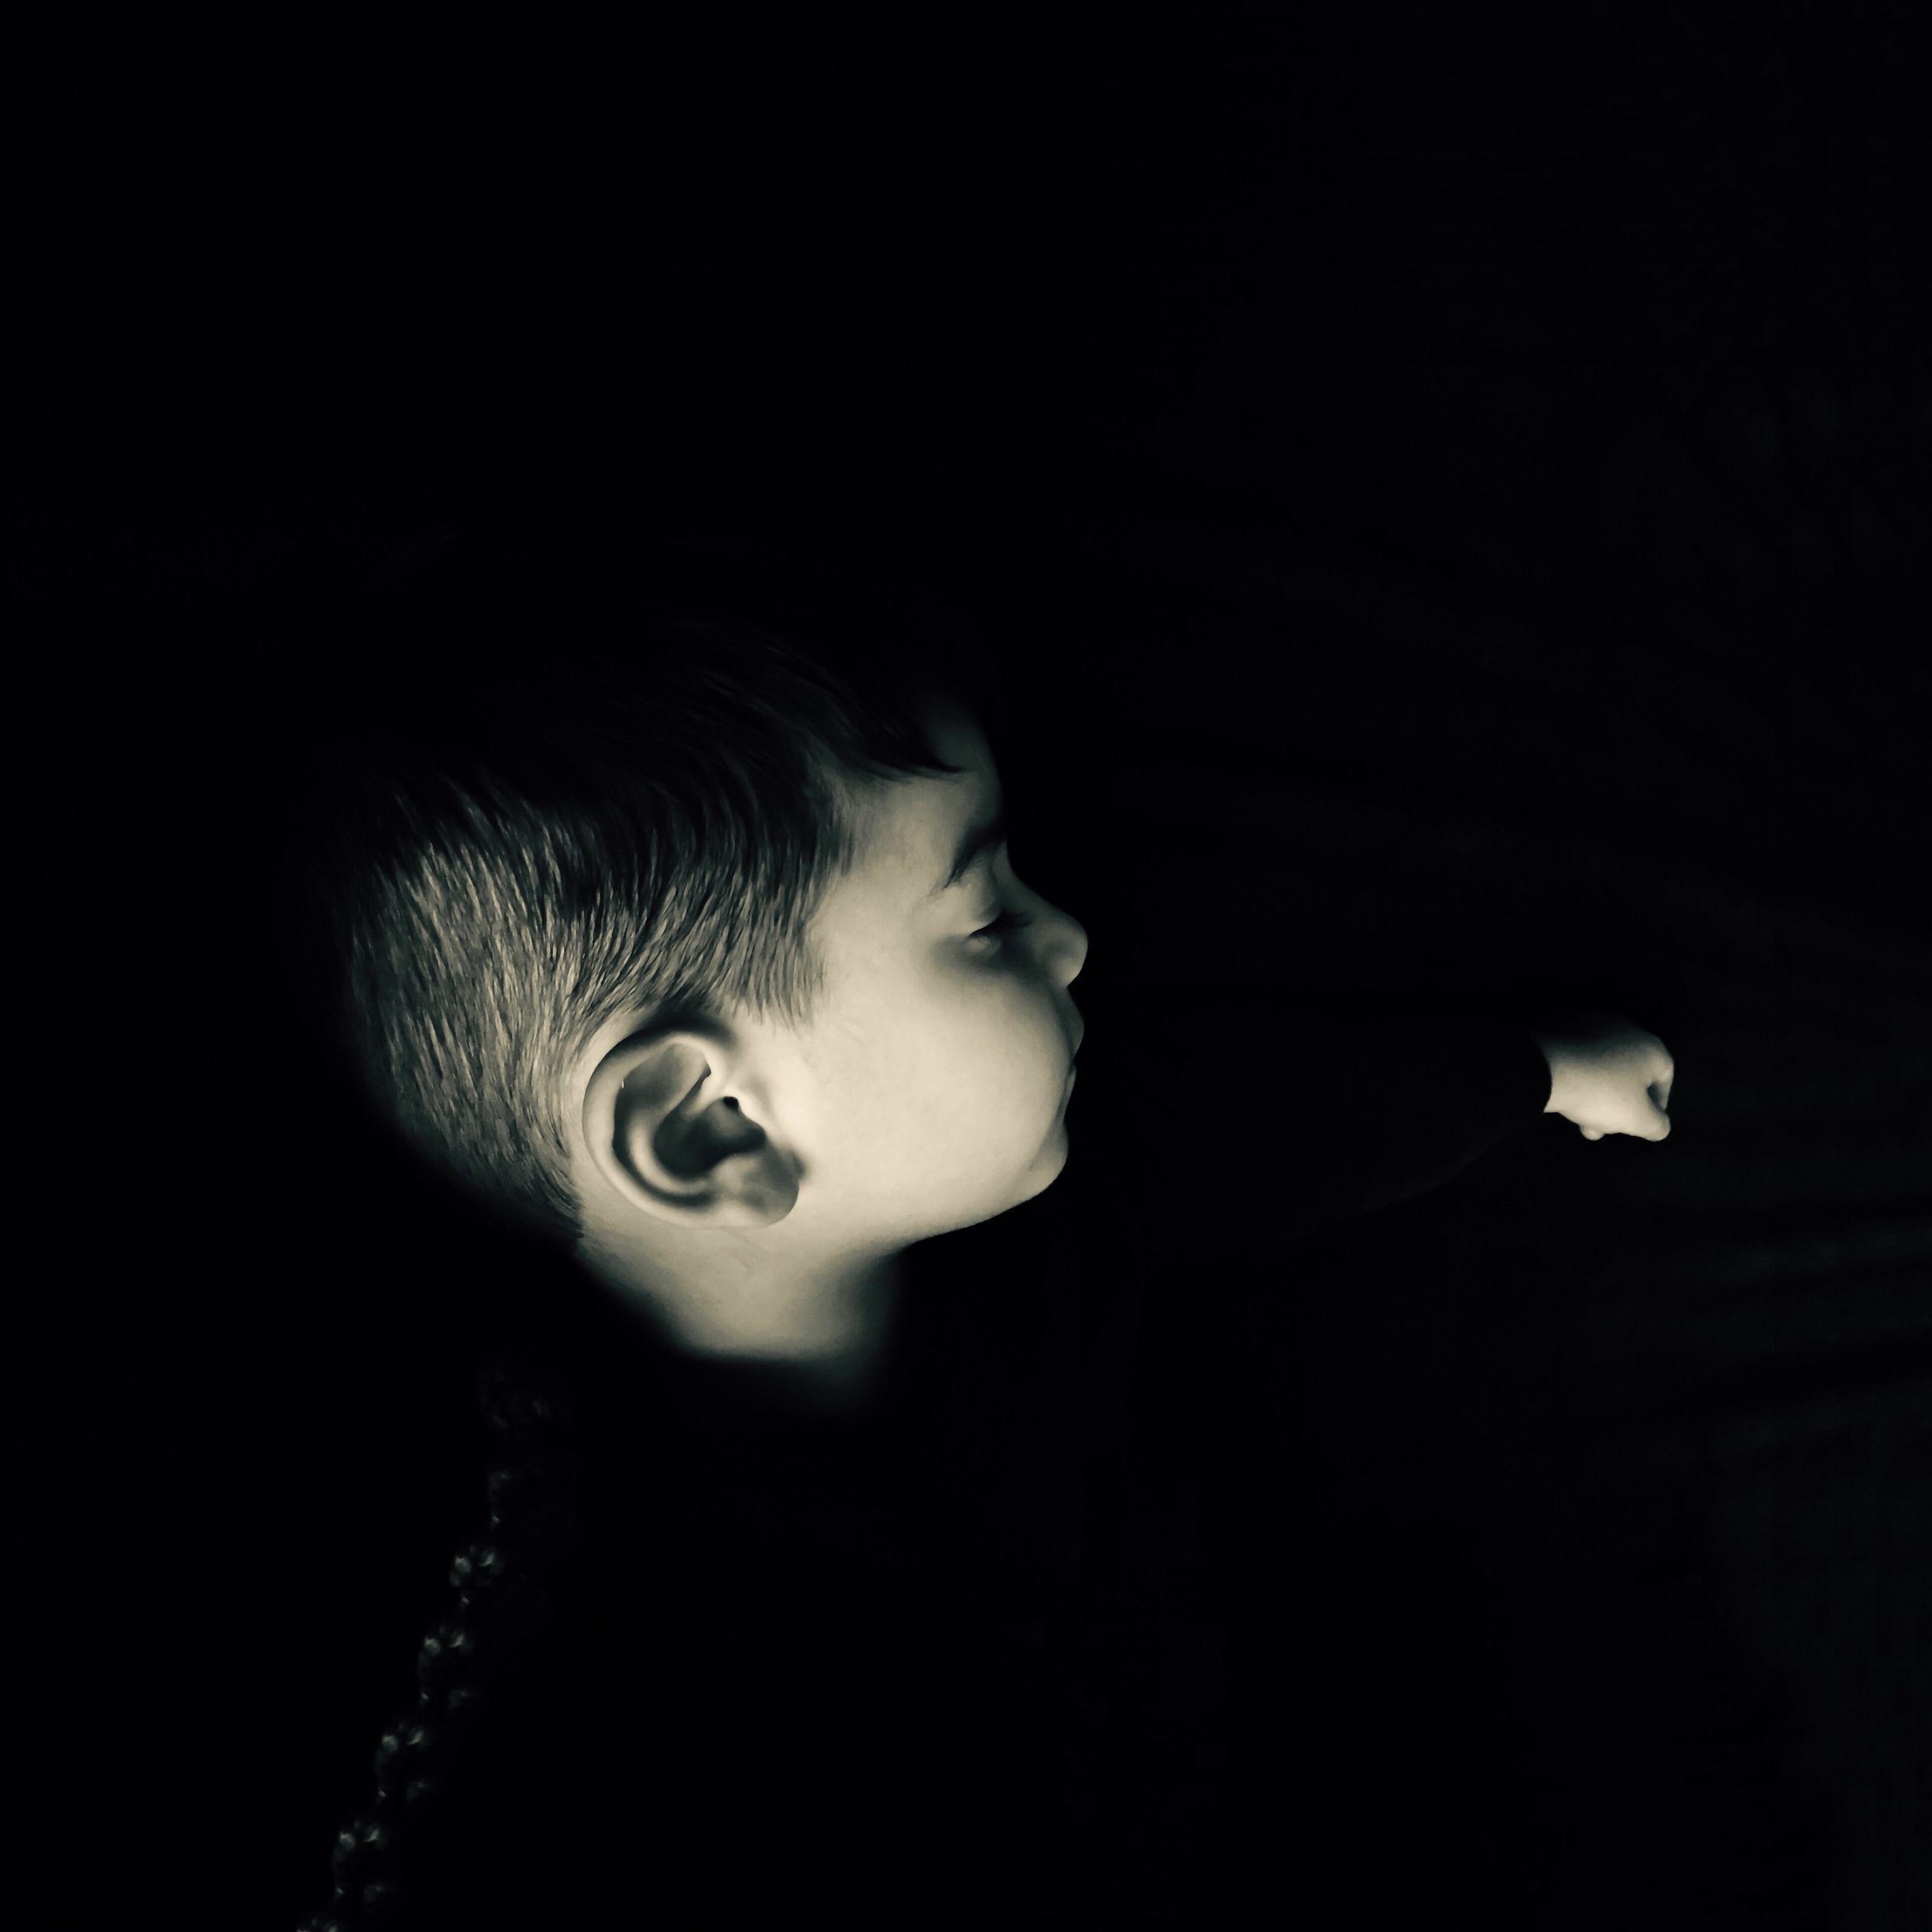 black background, studio shot, indoors, copy space, dark, night, close-up, darkroom, illuminated, single object, art, light - natural phenomenon, creativity, no people, cut out, art and craft, still life, lighting equipment, glowing, spooky